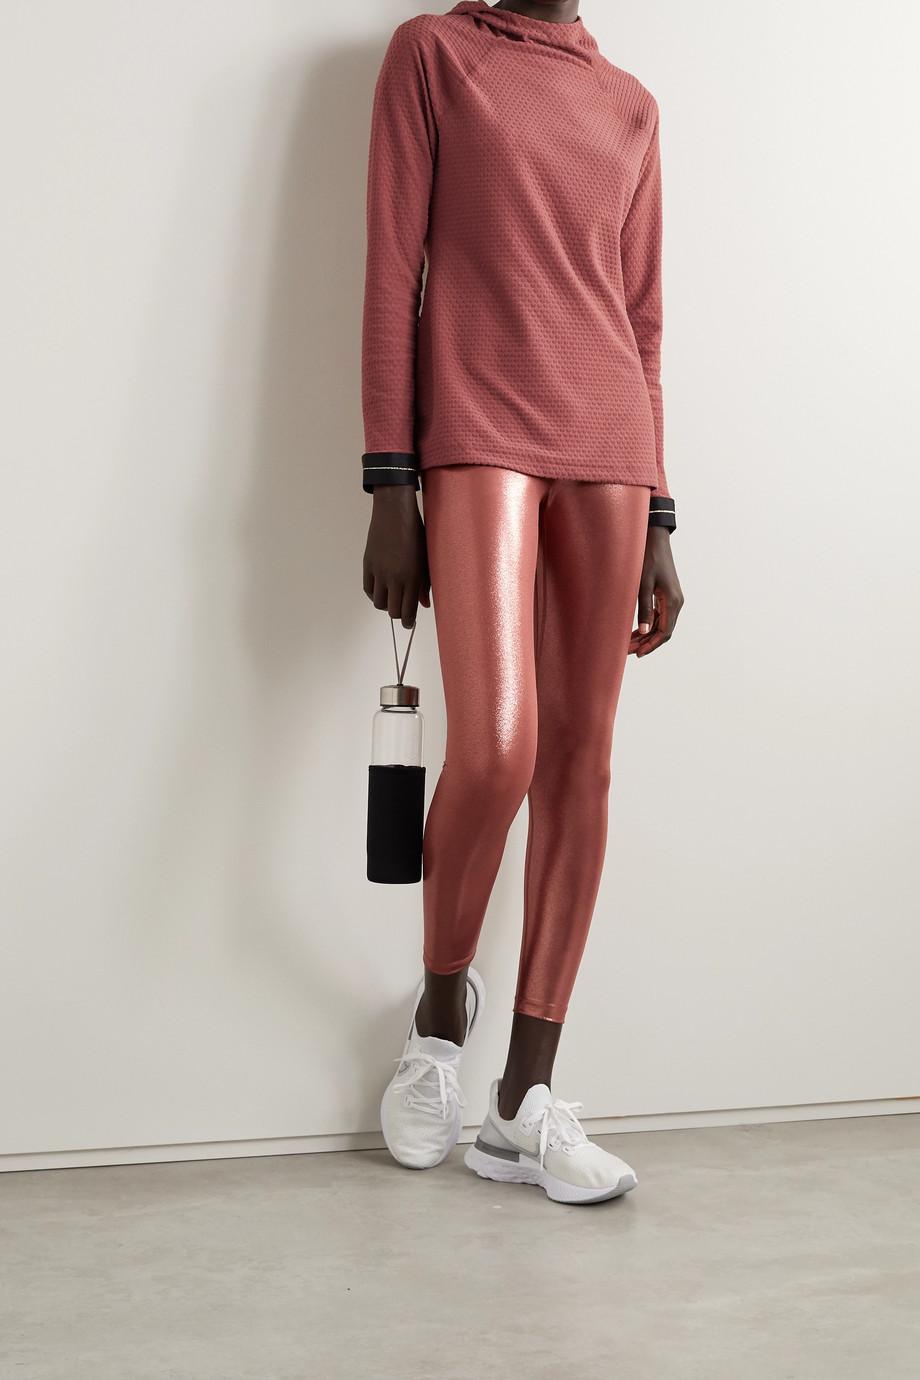 Nike Icon Clash cropped metallic Dri-FIT leggings